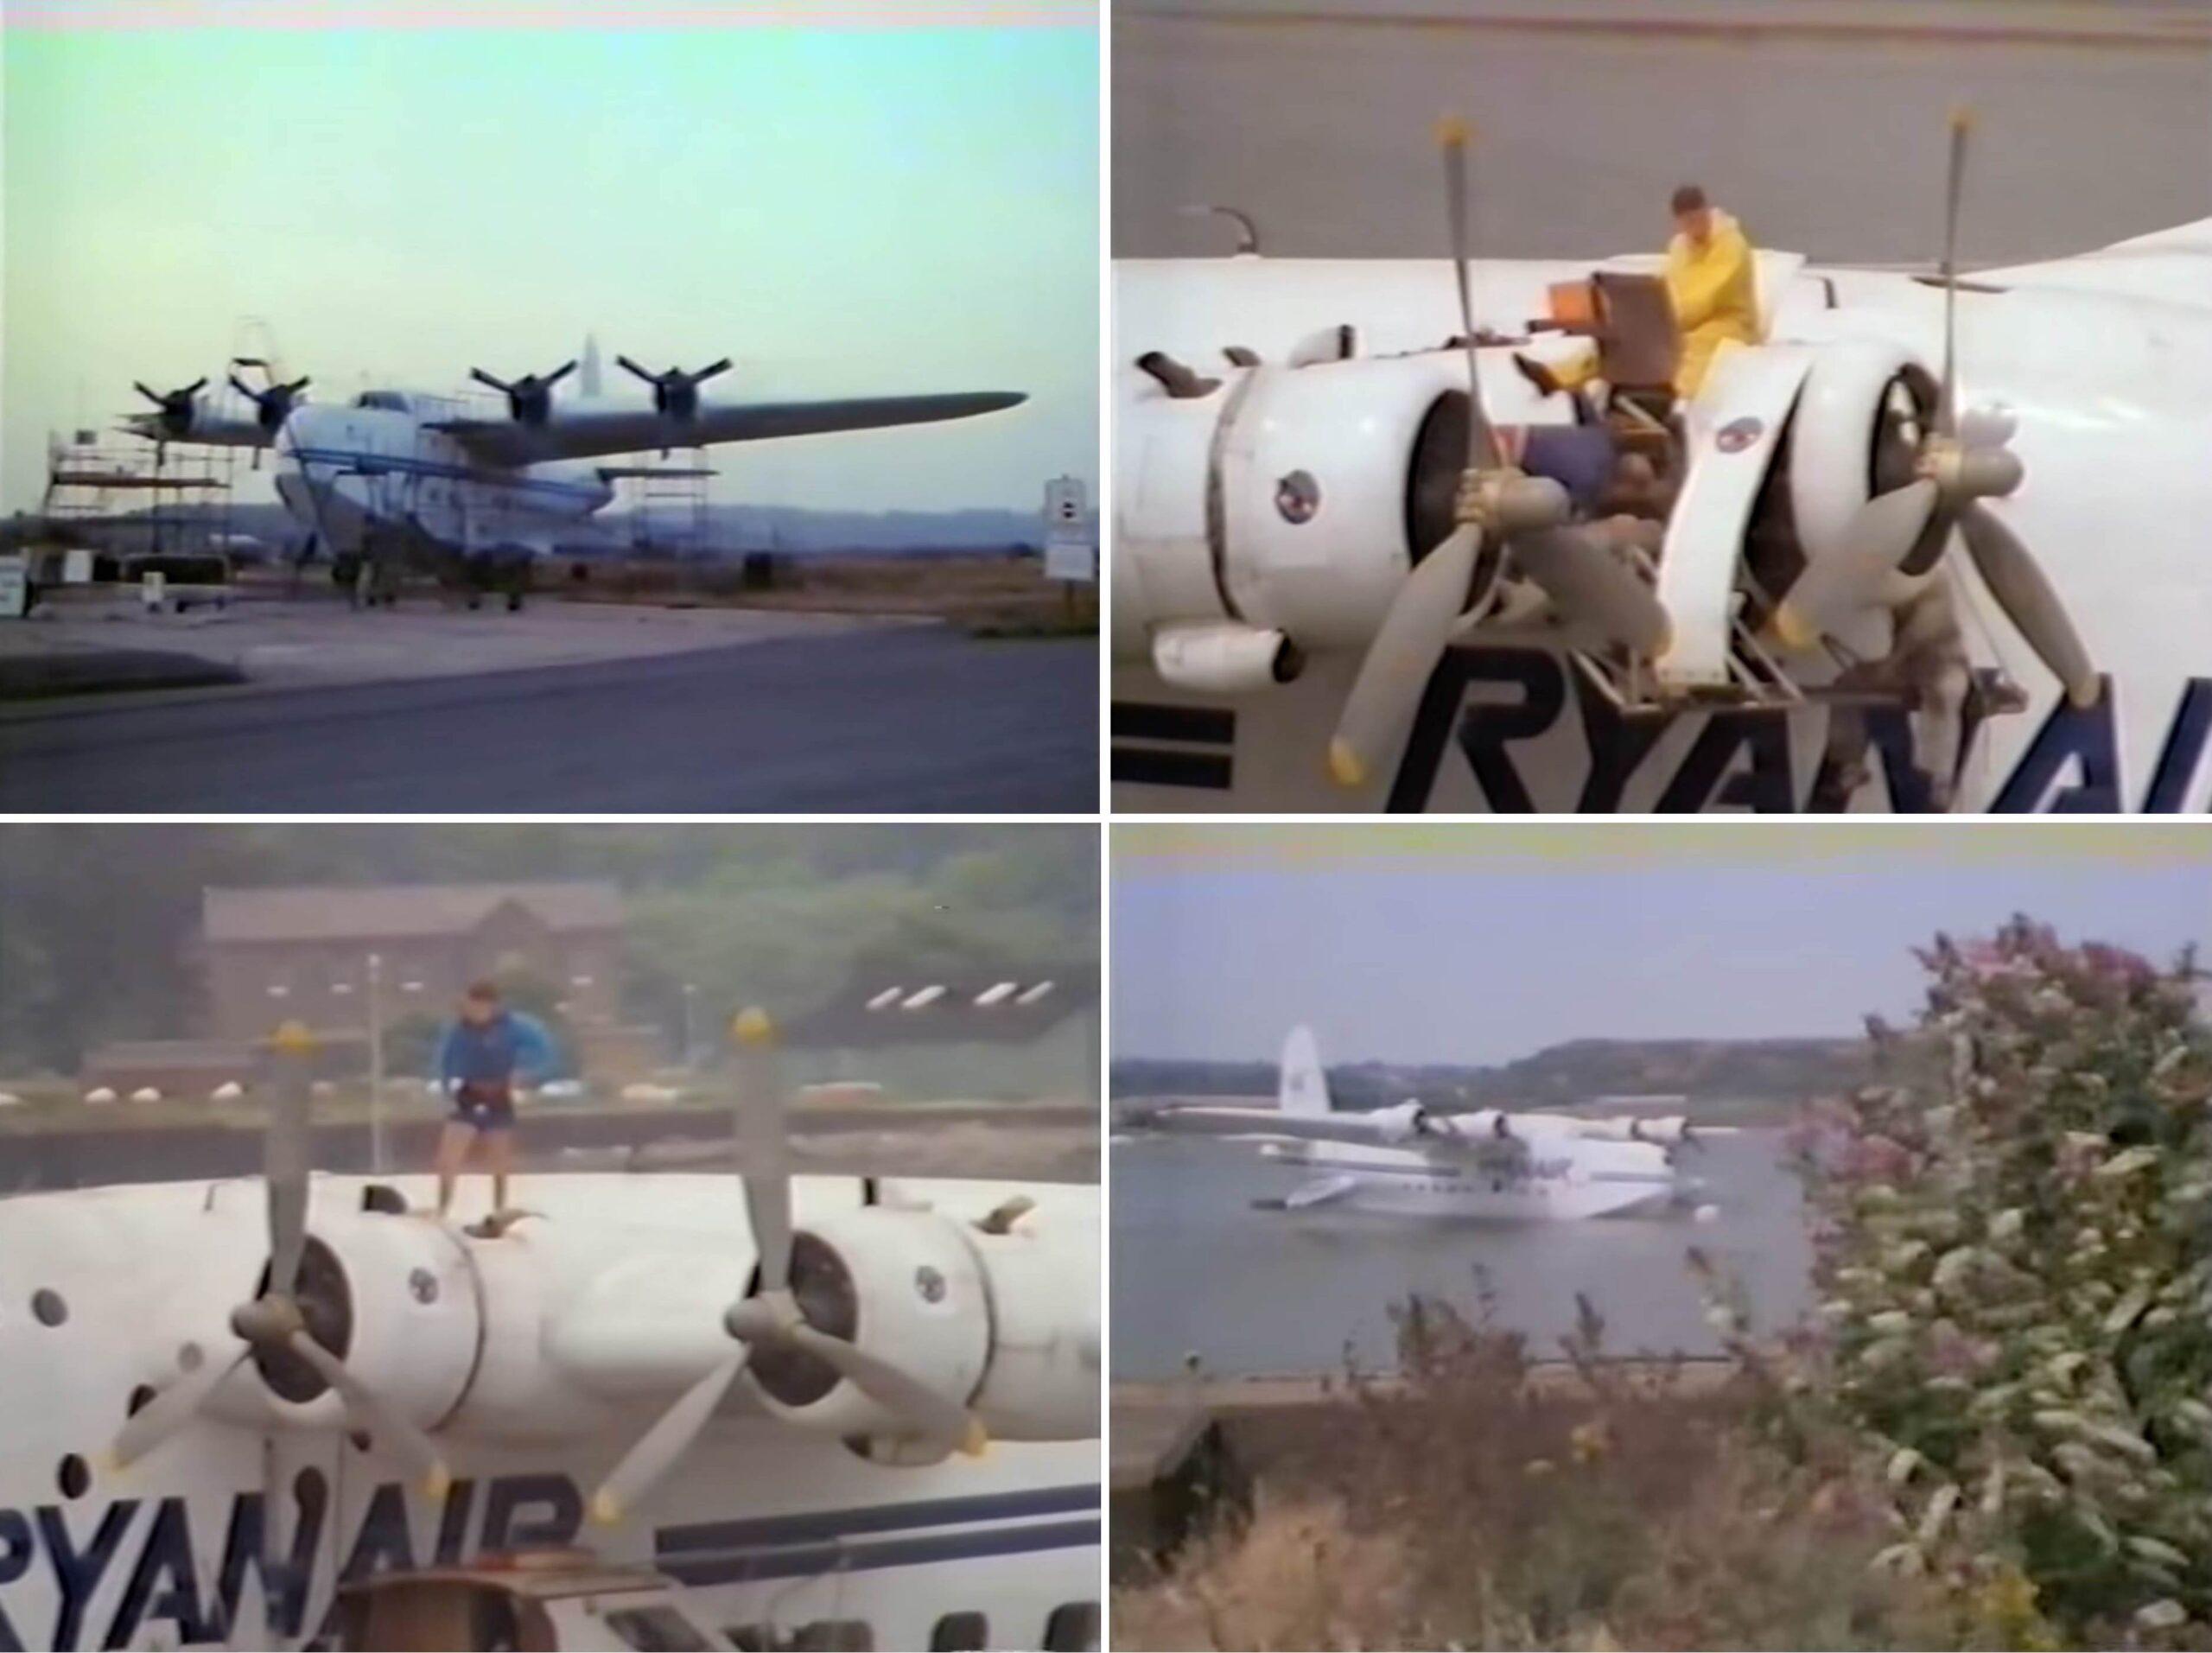 Edward's Flying Boat Collage 1